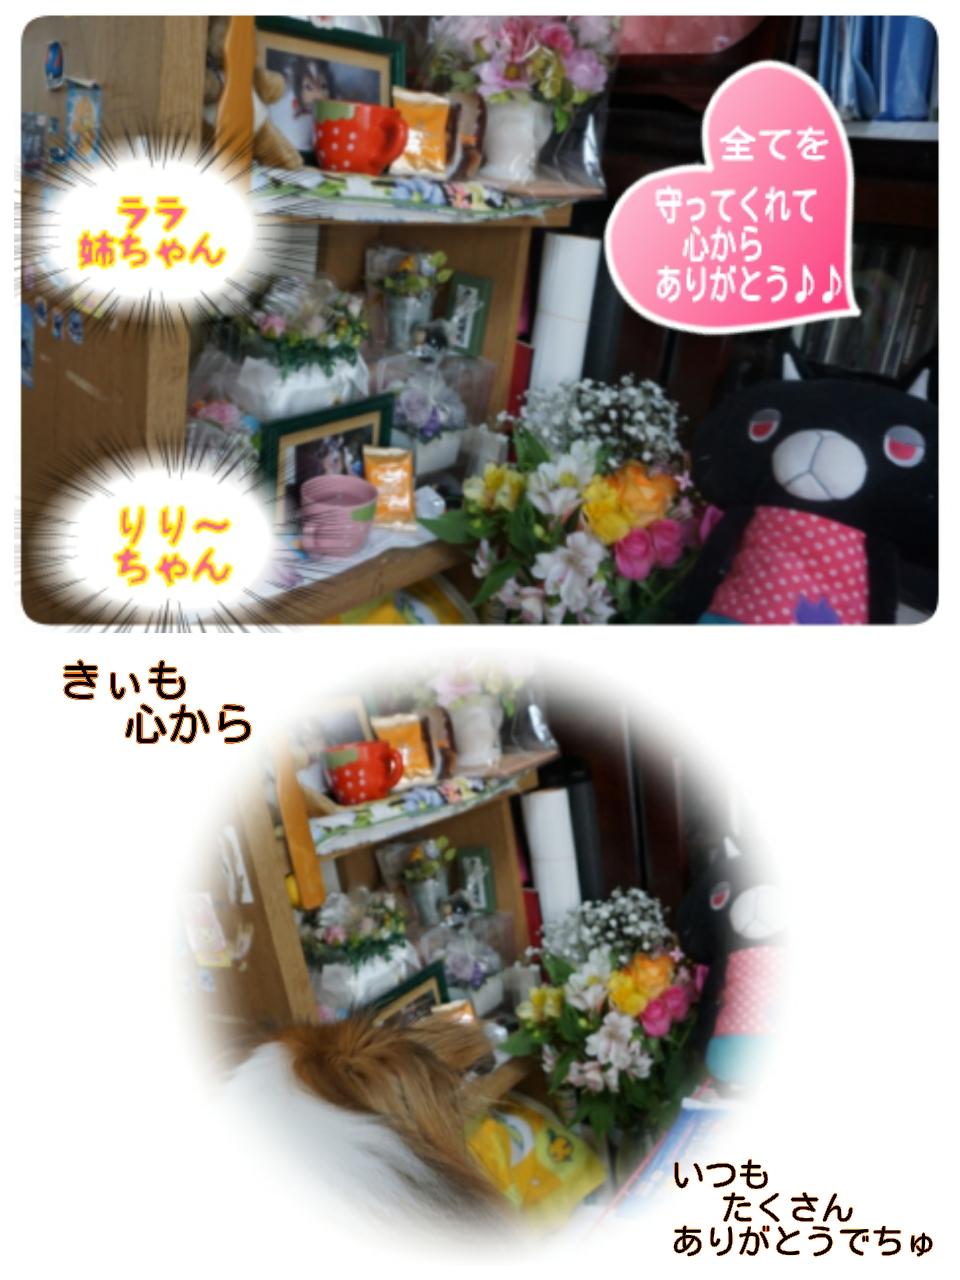 15-10-06-17-52-08-605_deco.jpg